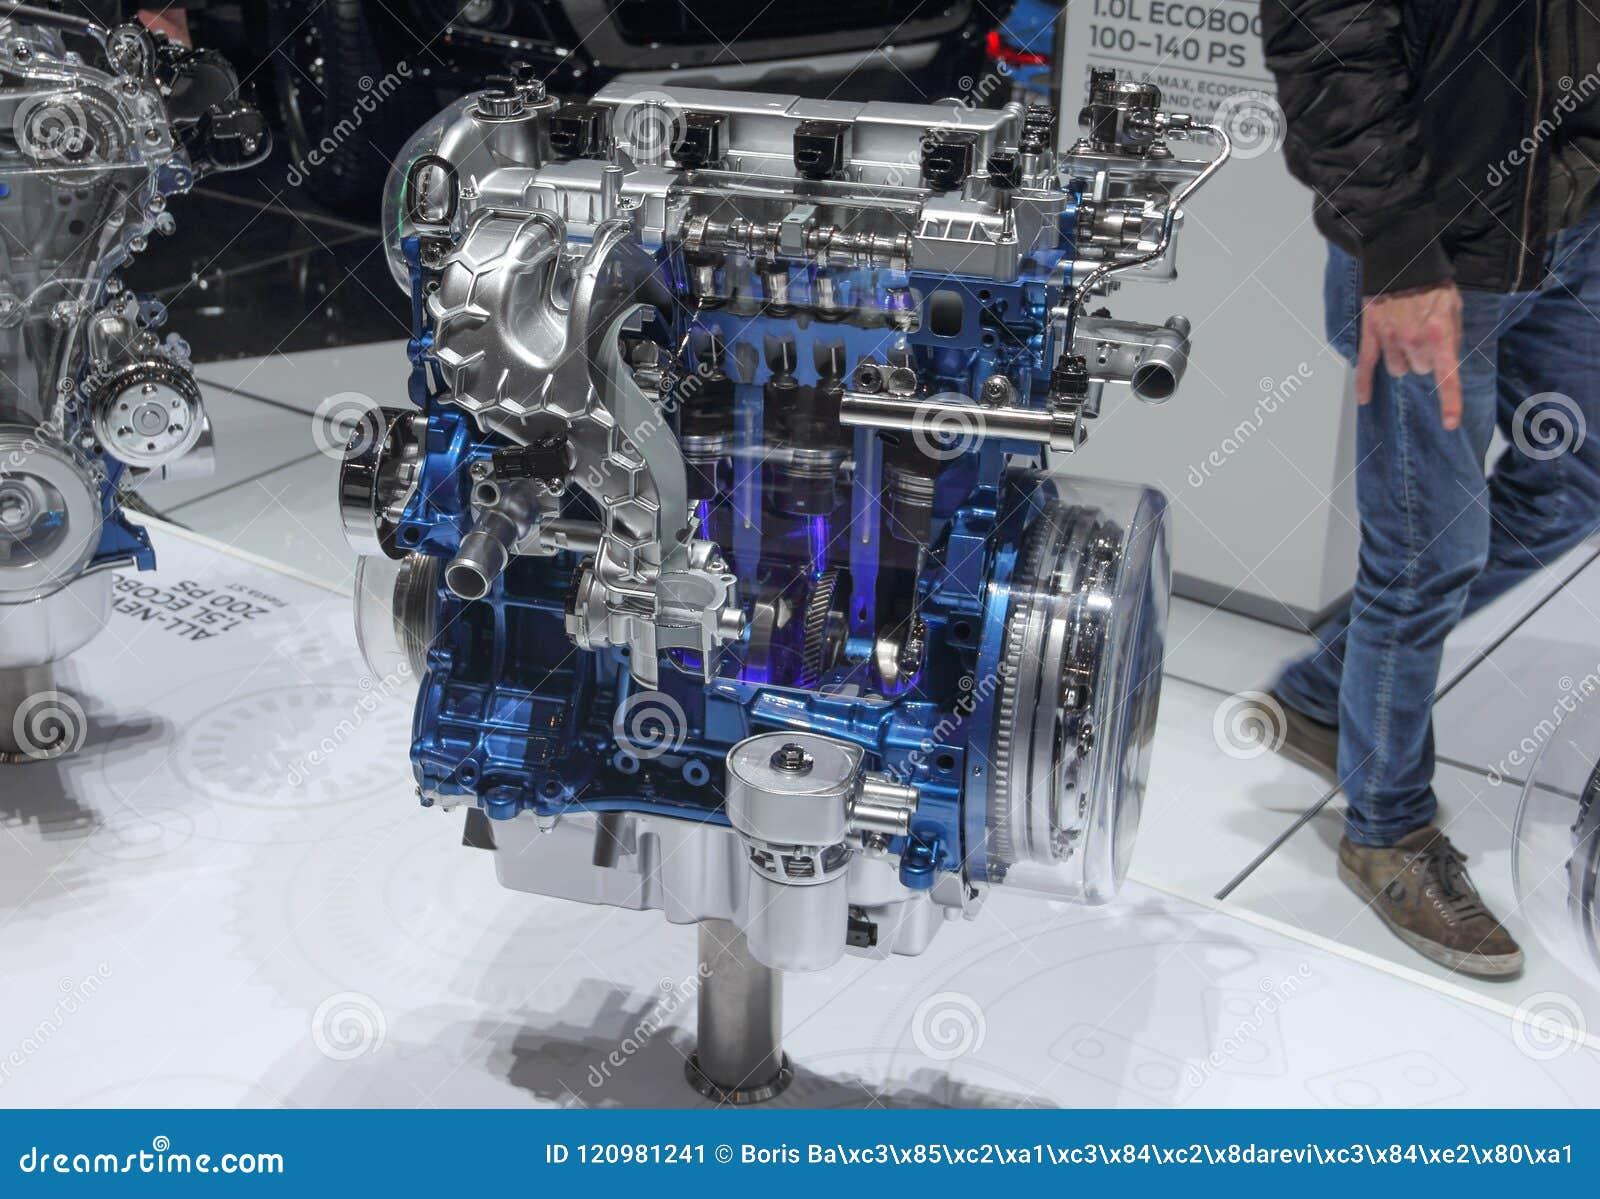 2.0 L Ecoboost >> Switzerland Geneva March 8 2018 The Ford 2 0l Ecoboost